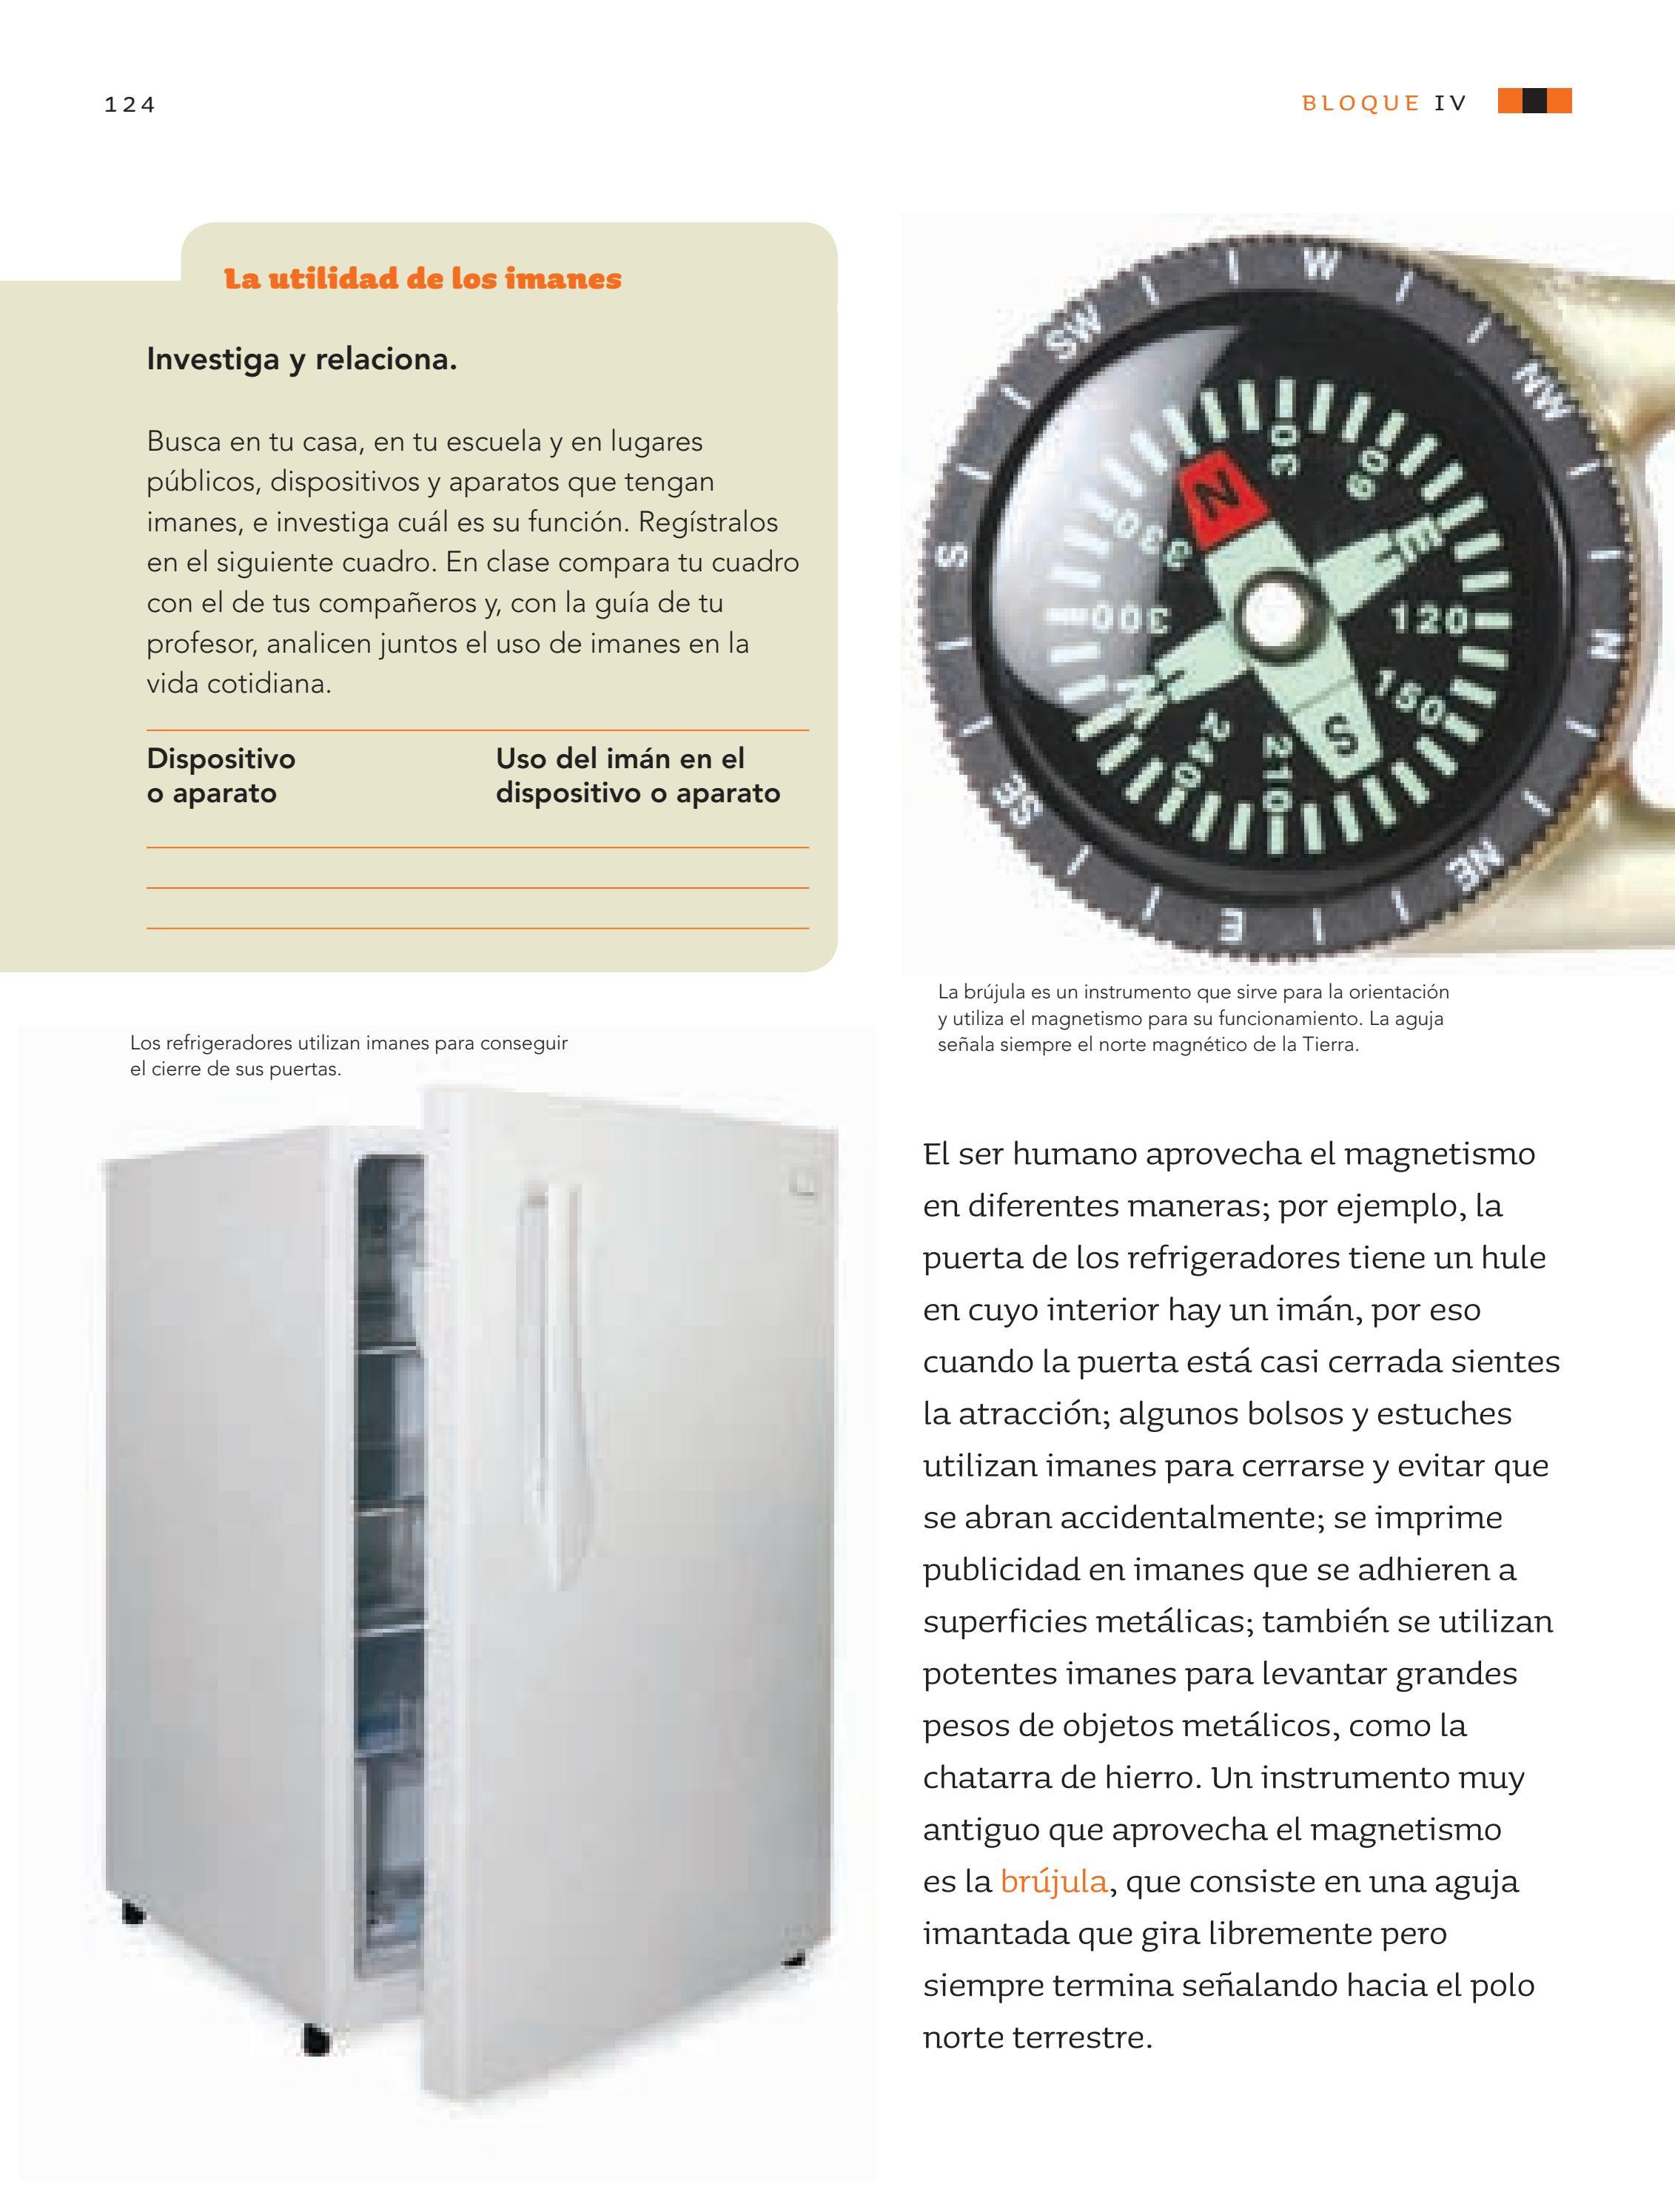 Ciencias naturales 3er grado by rar muri page 126 issuu - Imanes para puertas ...